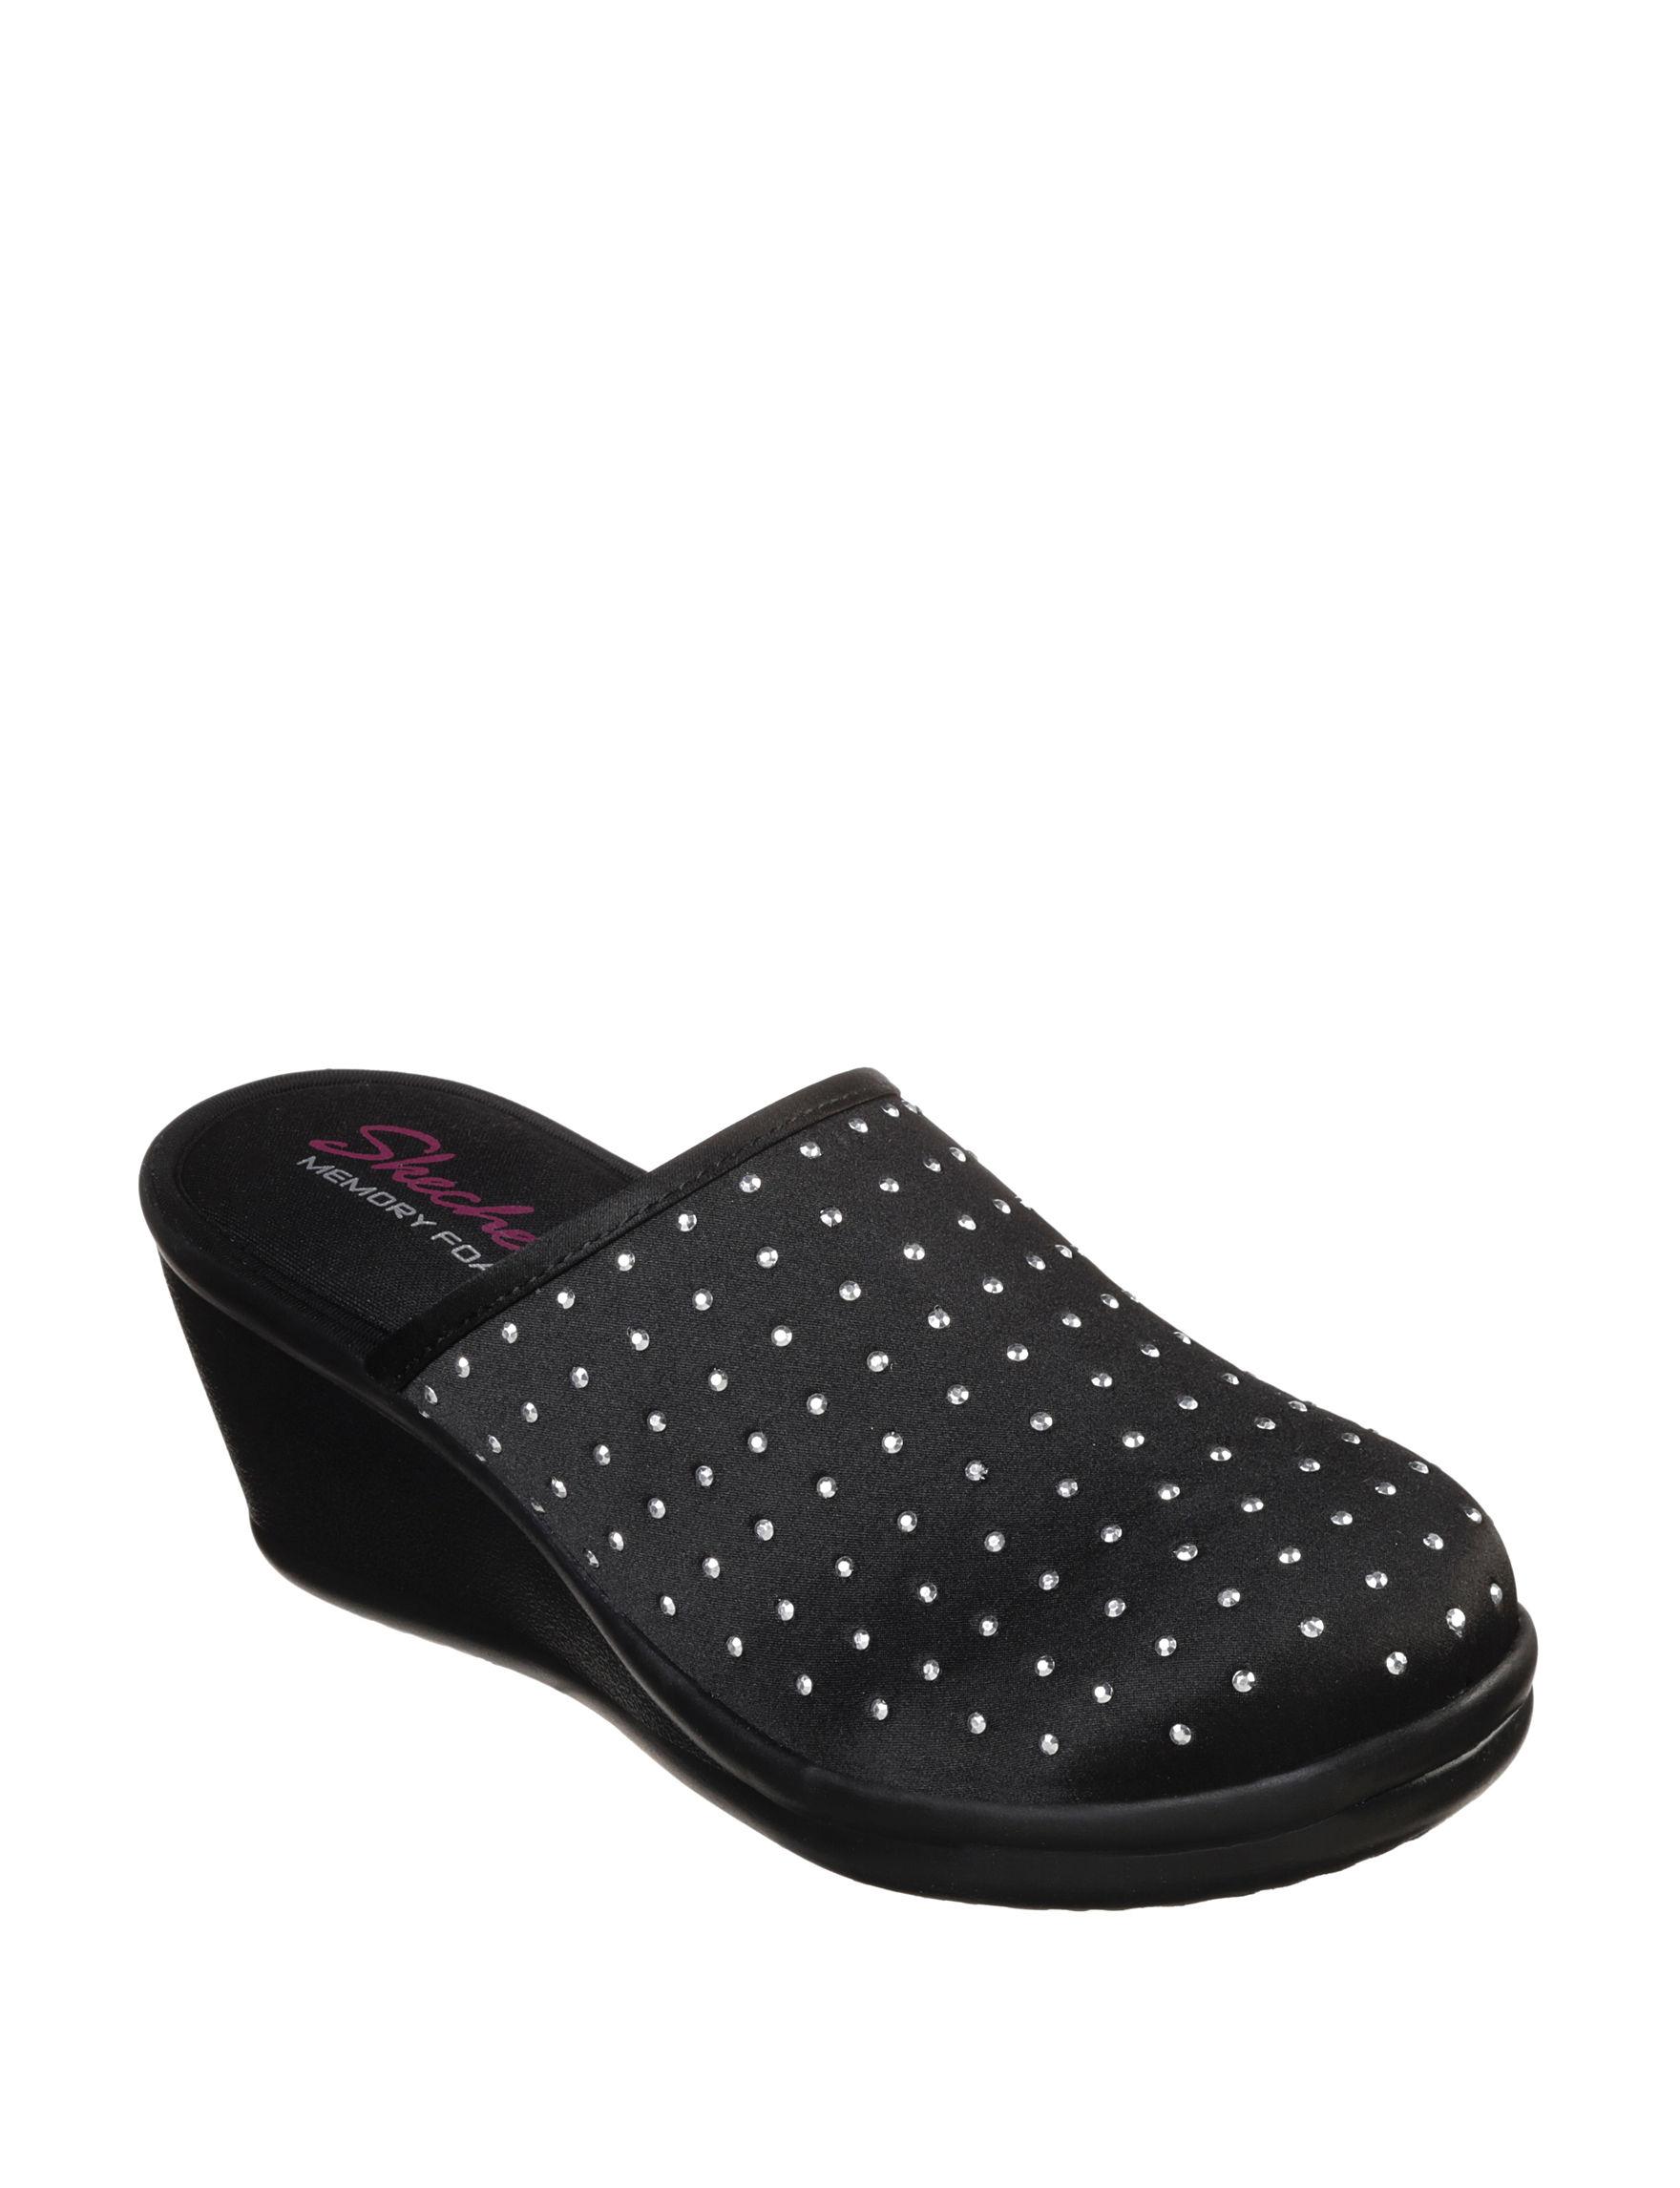 Skechers Black Clogs